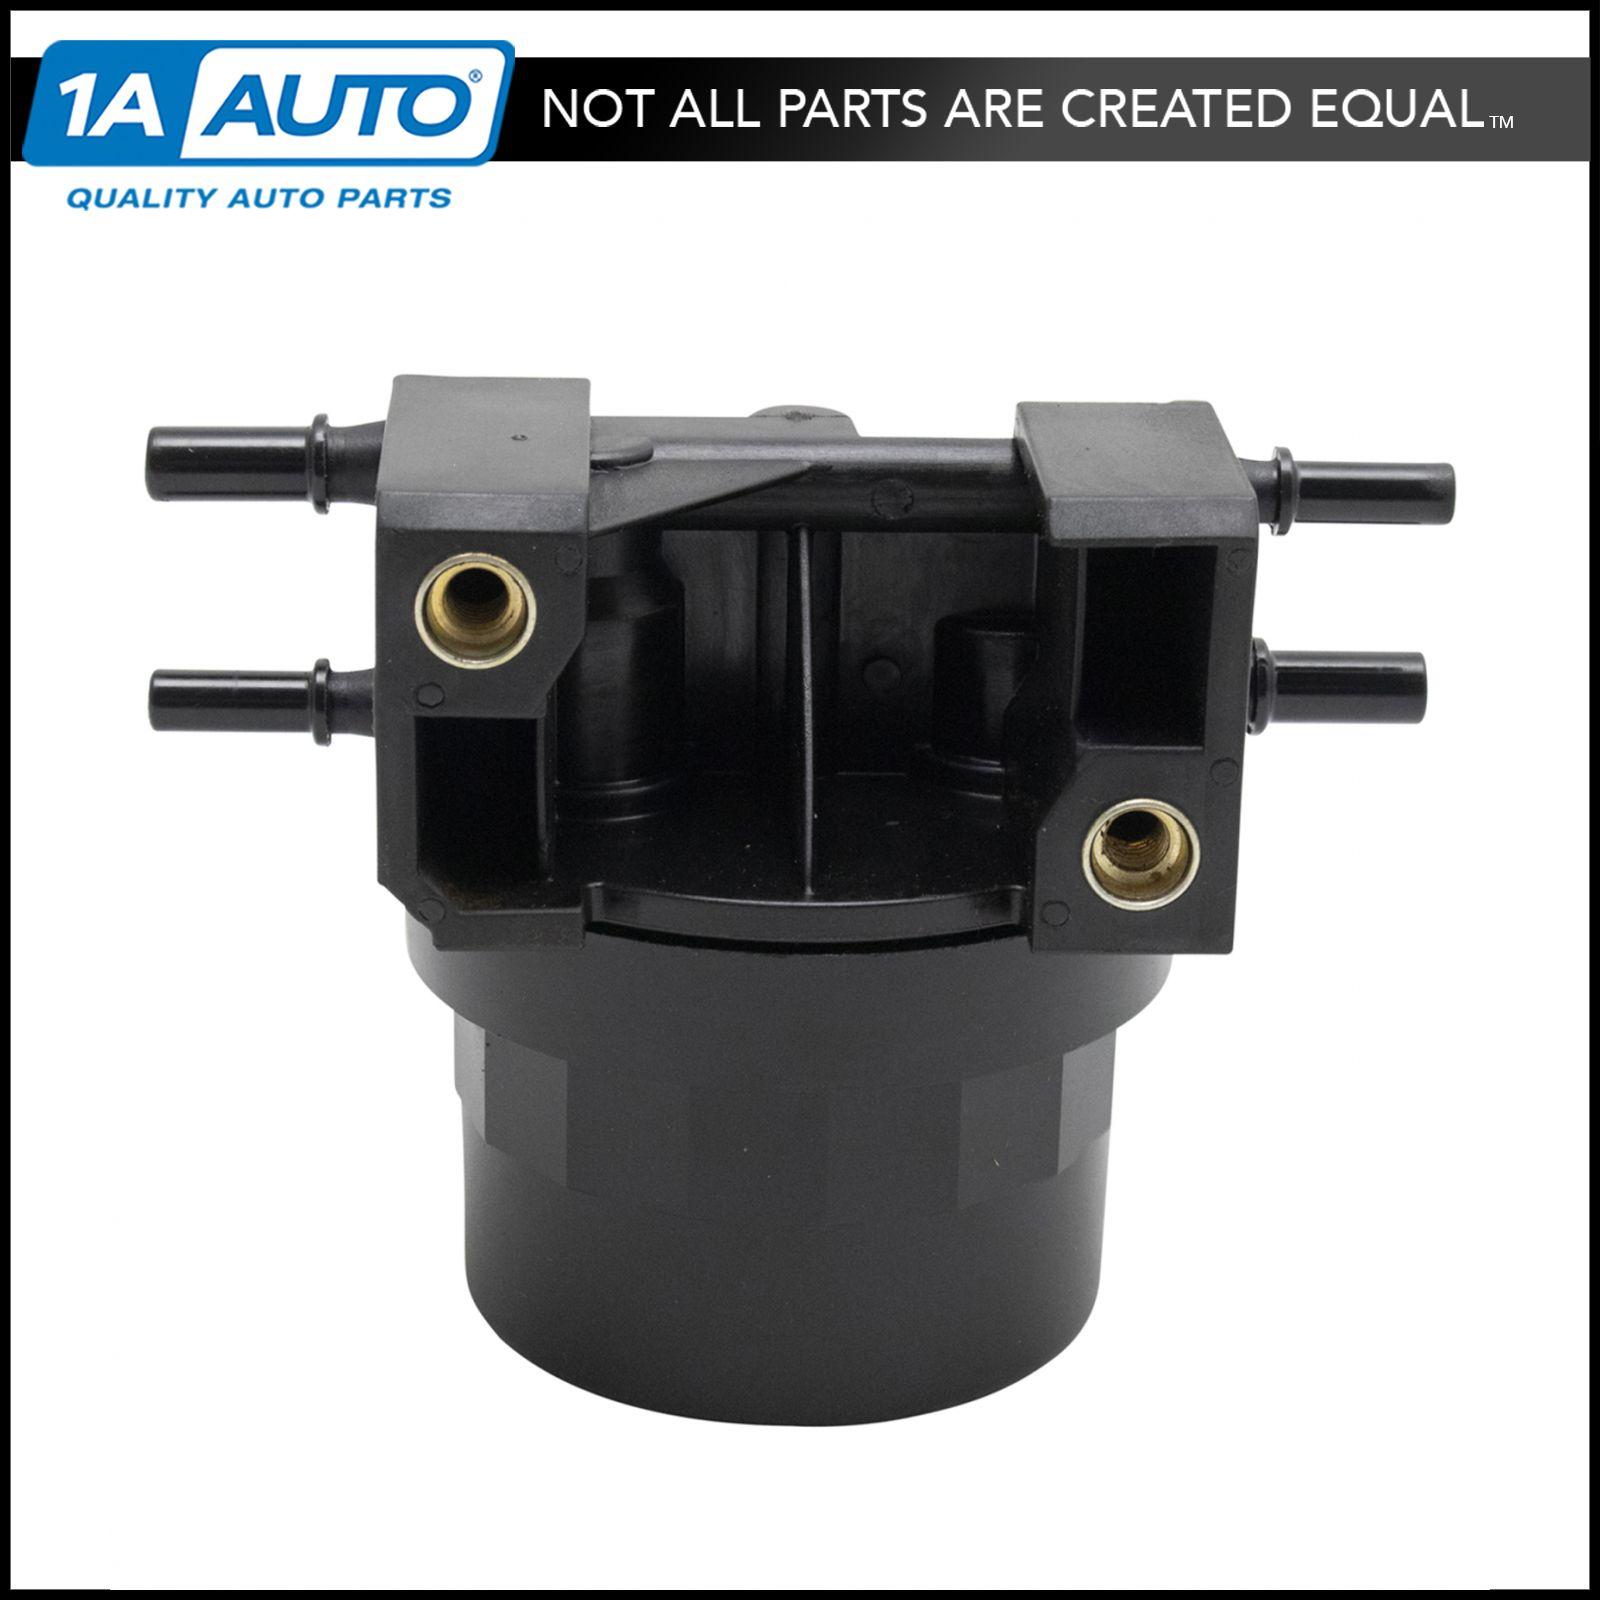 Oem Fuel Reservoir Accumulator For Ford E150 E250 F150 F250 Ranger 91 Filter Bronco